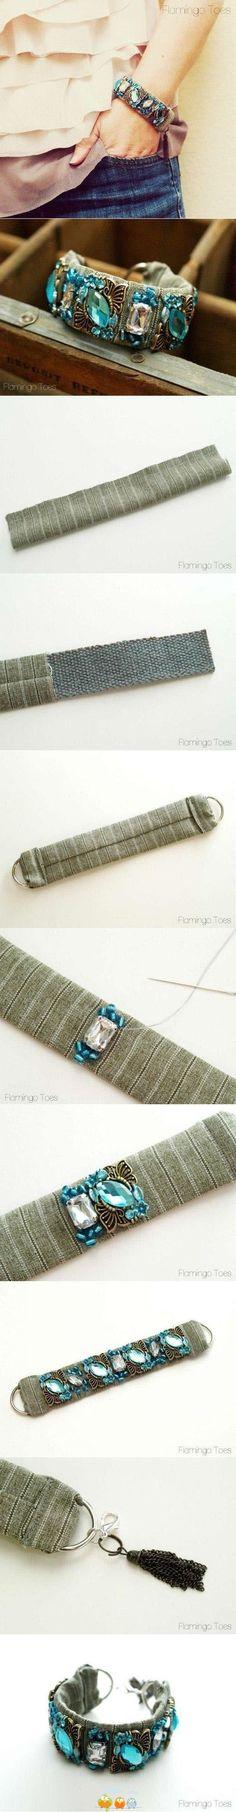 #diy #sewing #jewelry